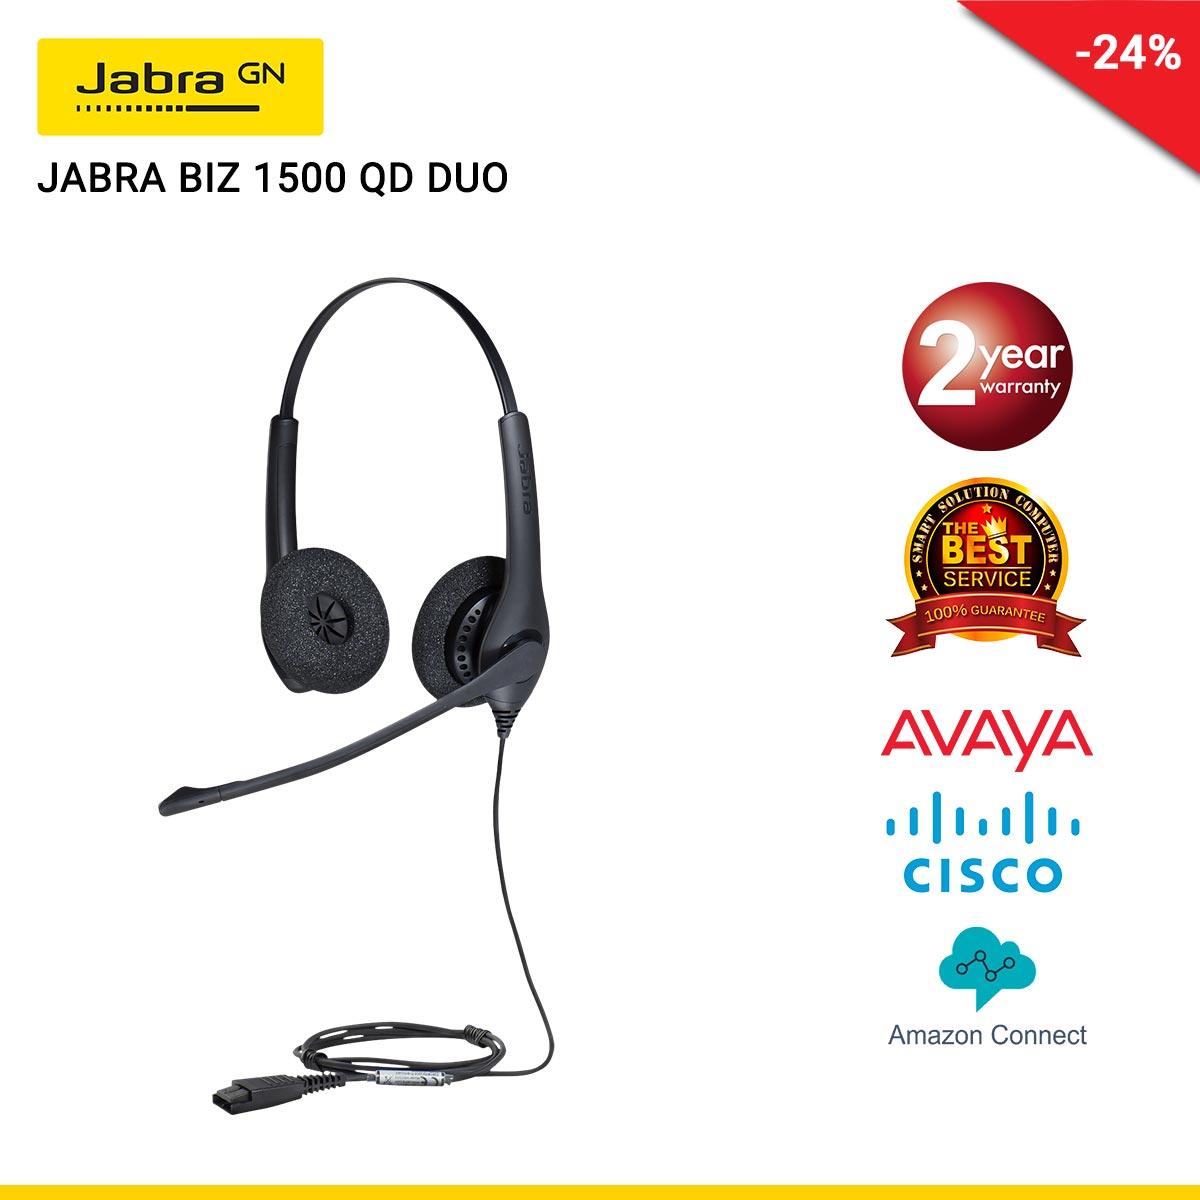 JABRA BIZ 1500 QD DUO (JBA-1519-0157)